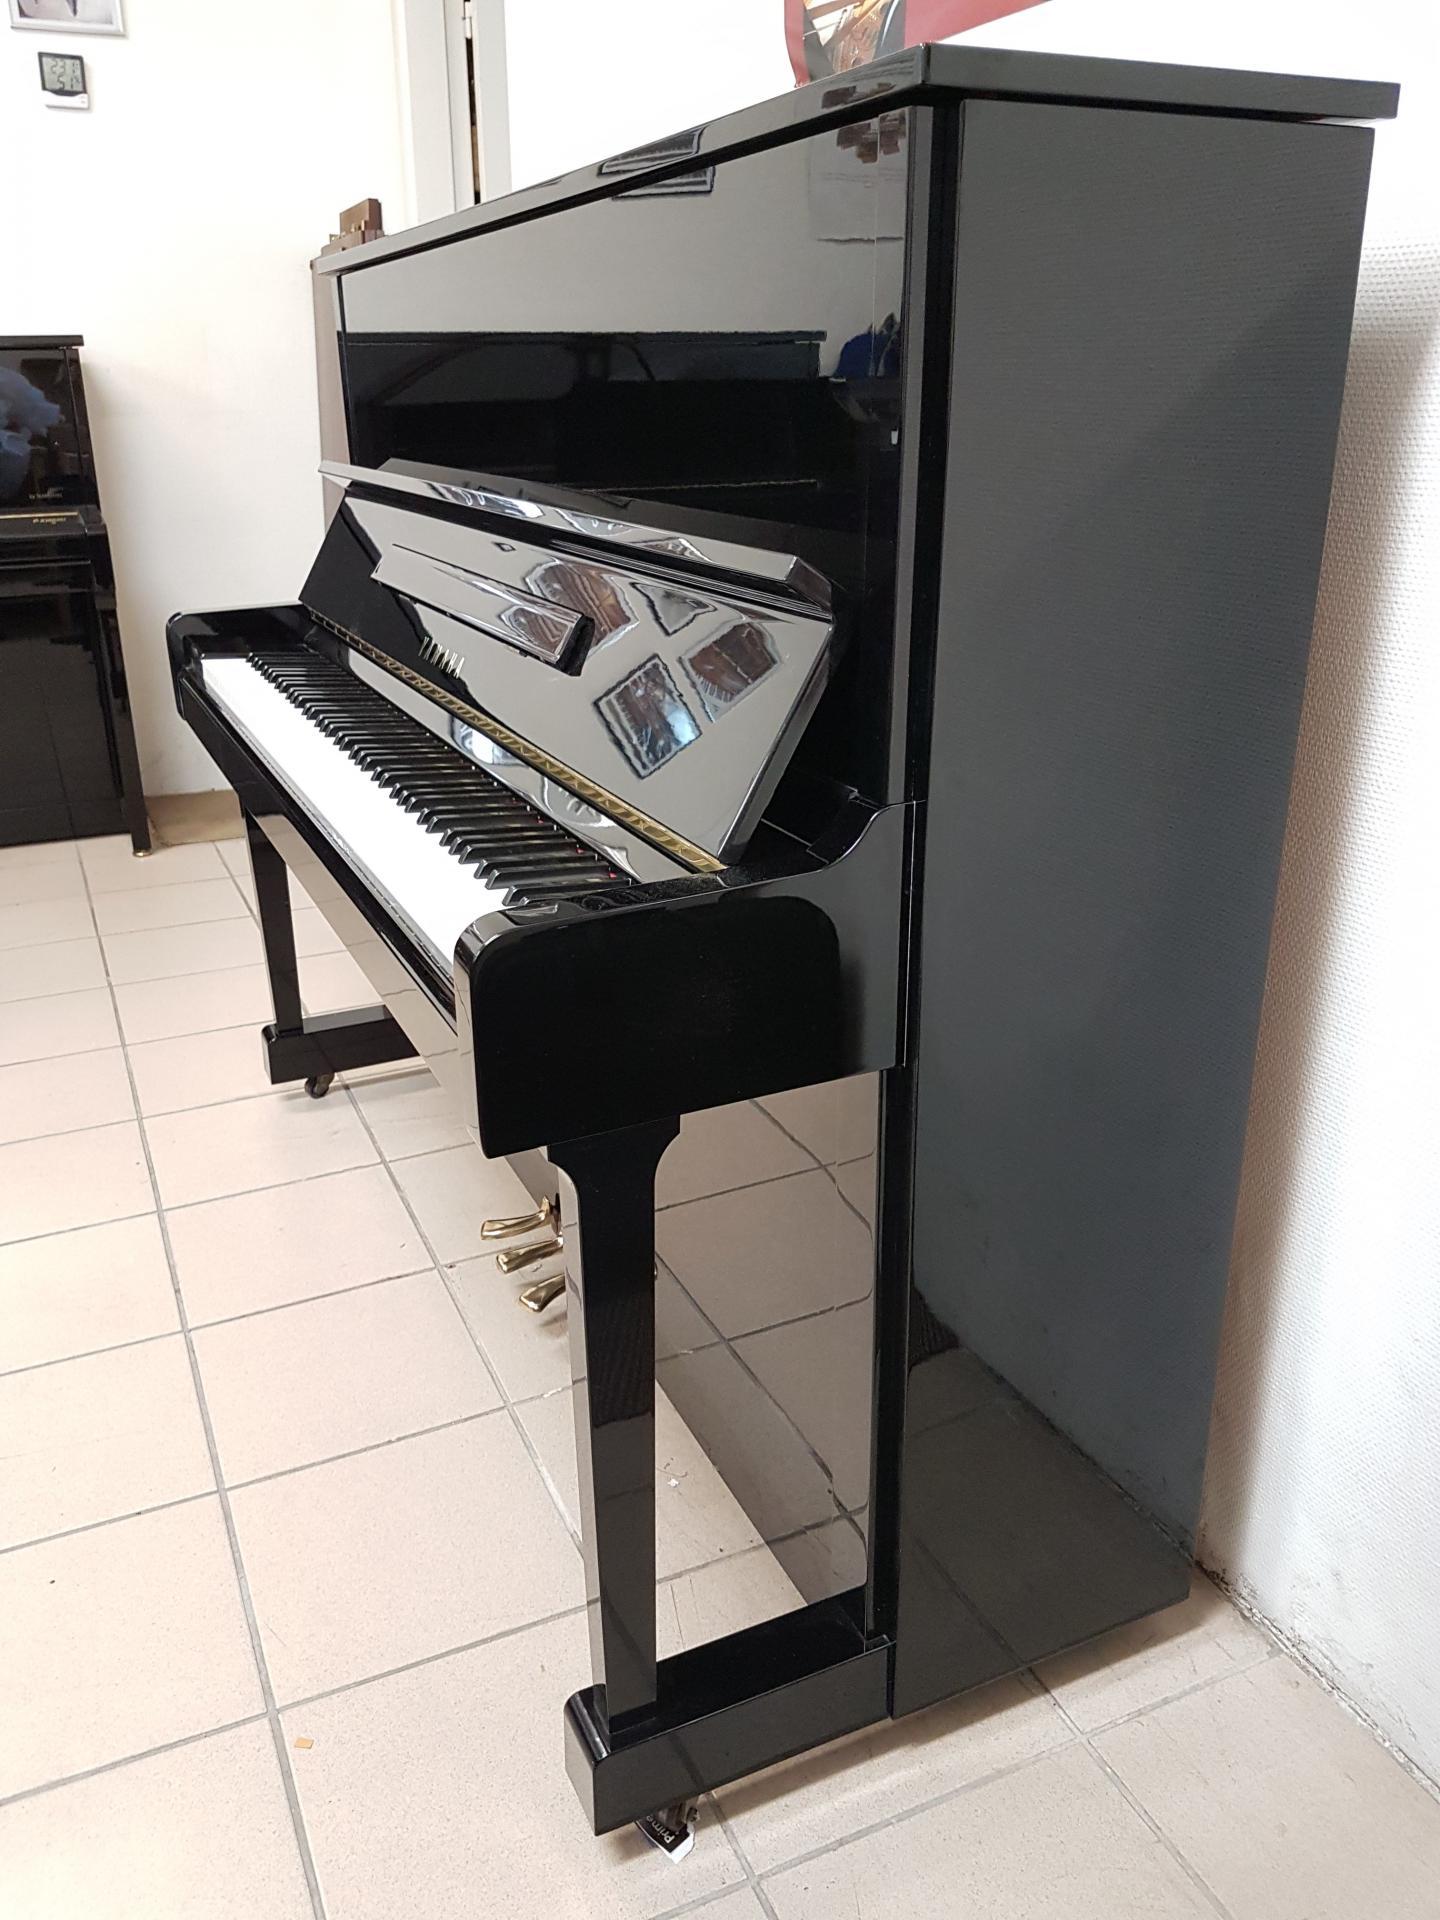 piano droit d 39 occasion yamaha u1 121 cm noir brillant 1987. Black Bedroom Furniture Sets. Home Design Ideas